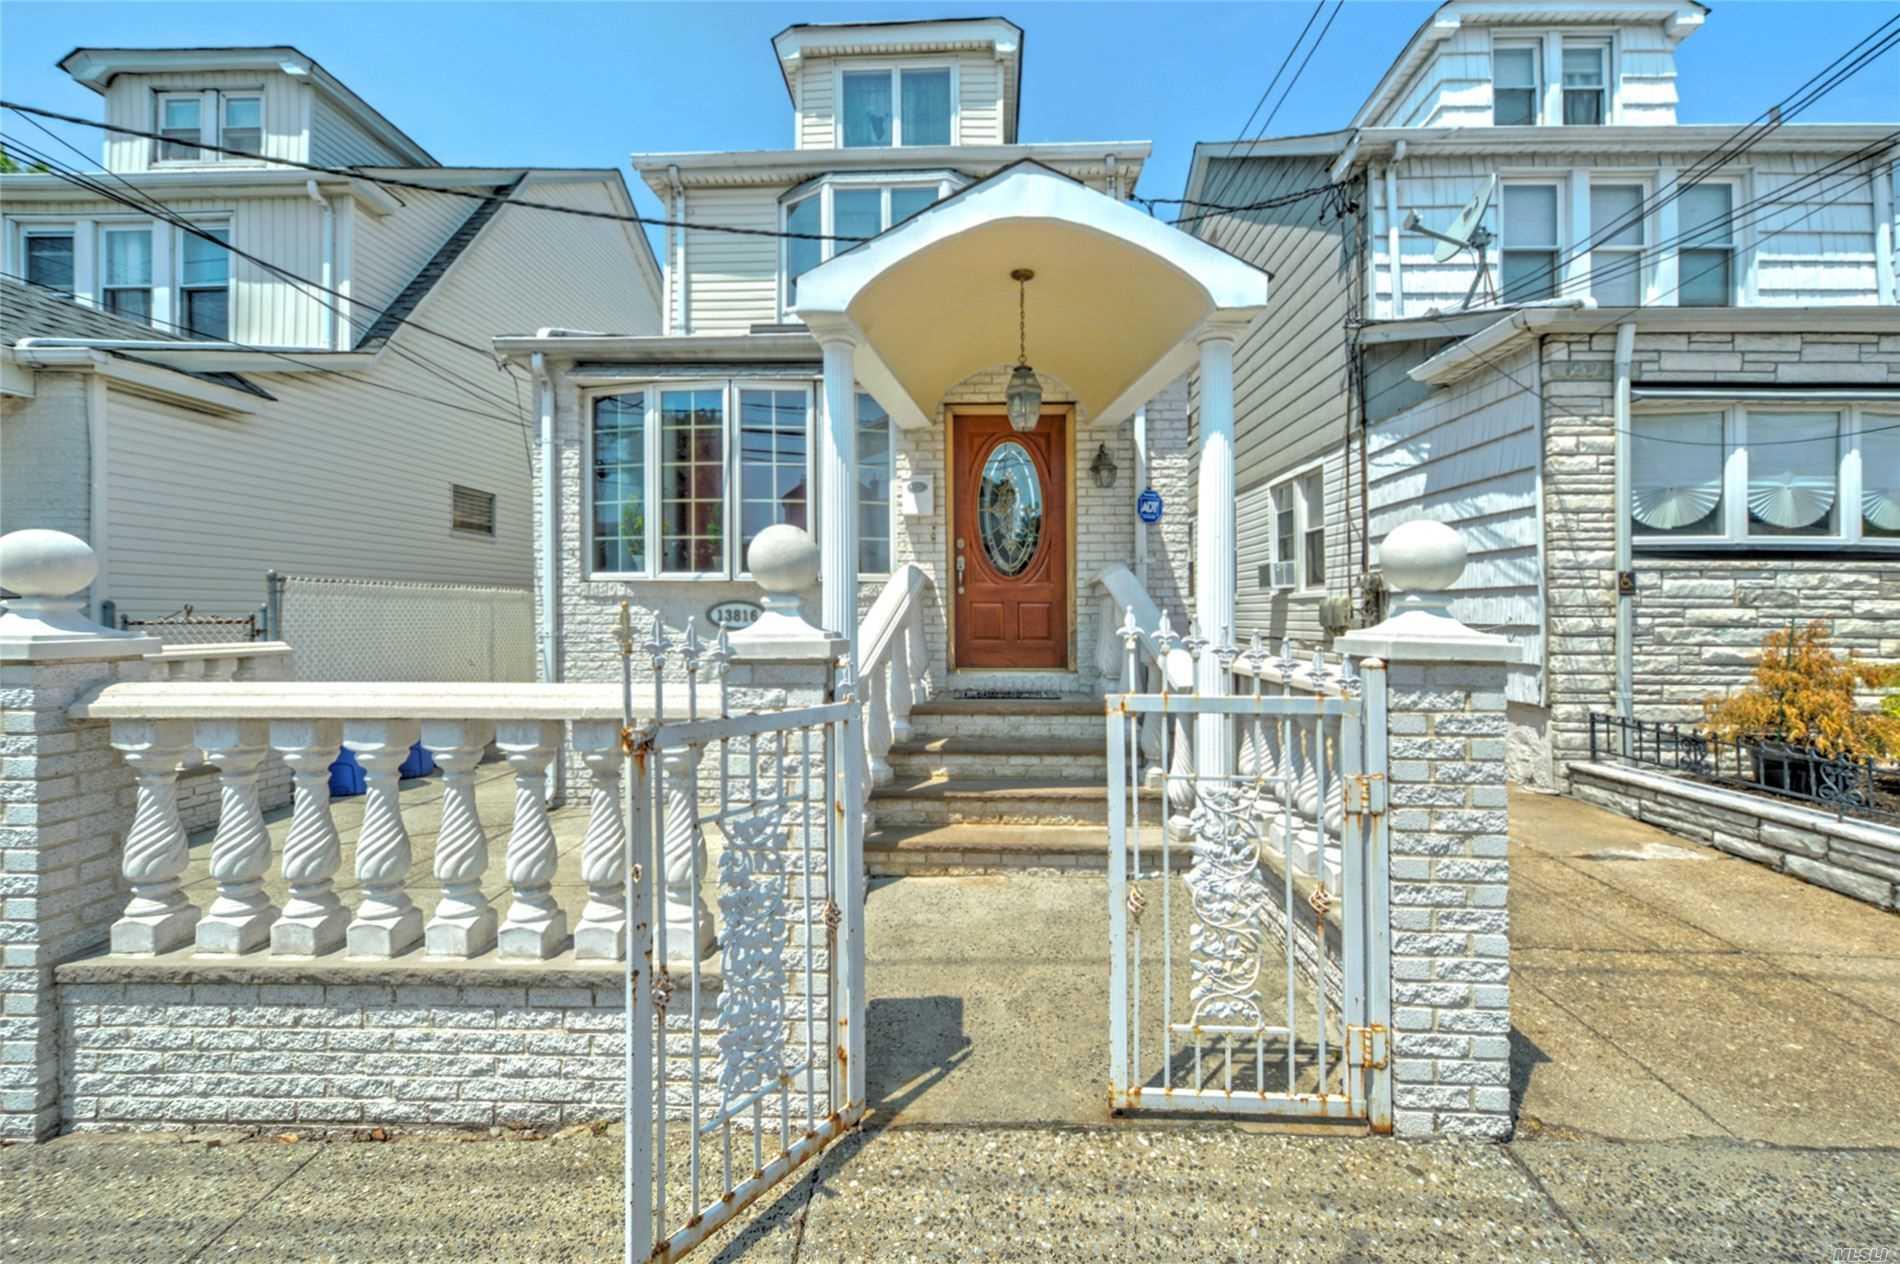 Property for sale at 138-16 Whitelaw Street, Ozone Park NY 11417, Ozone Park,  New York 11417